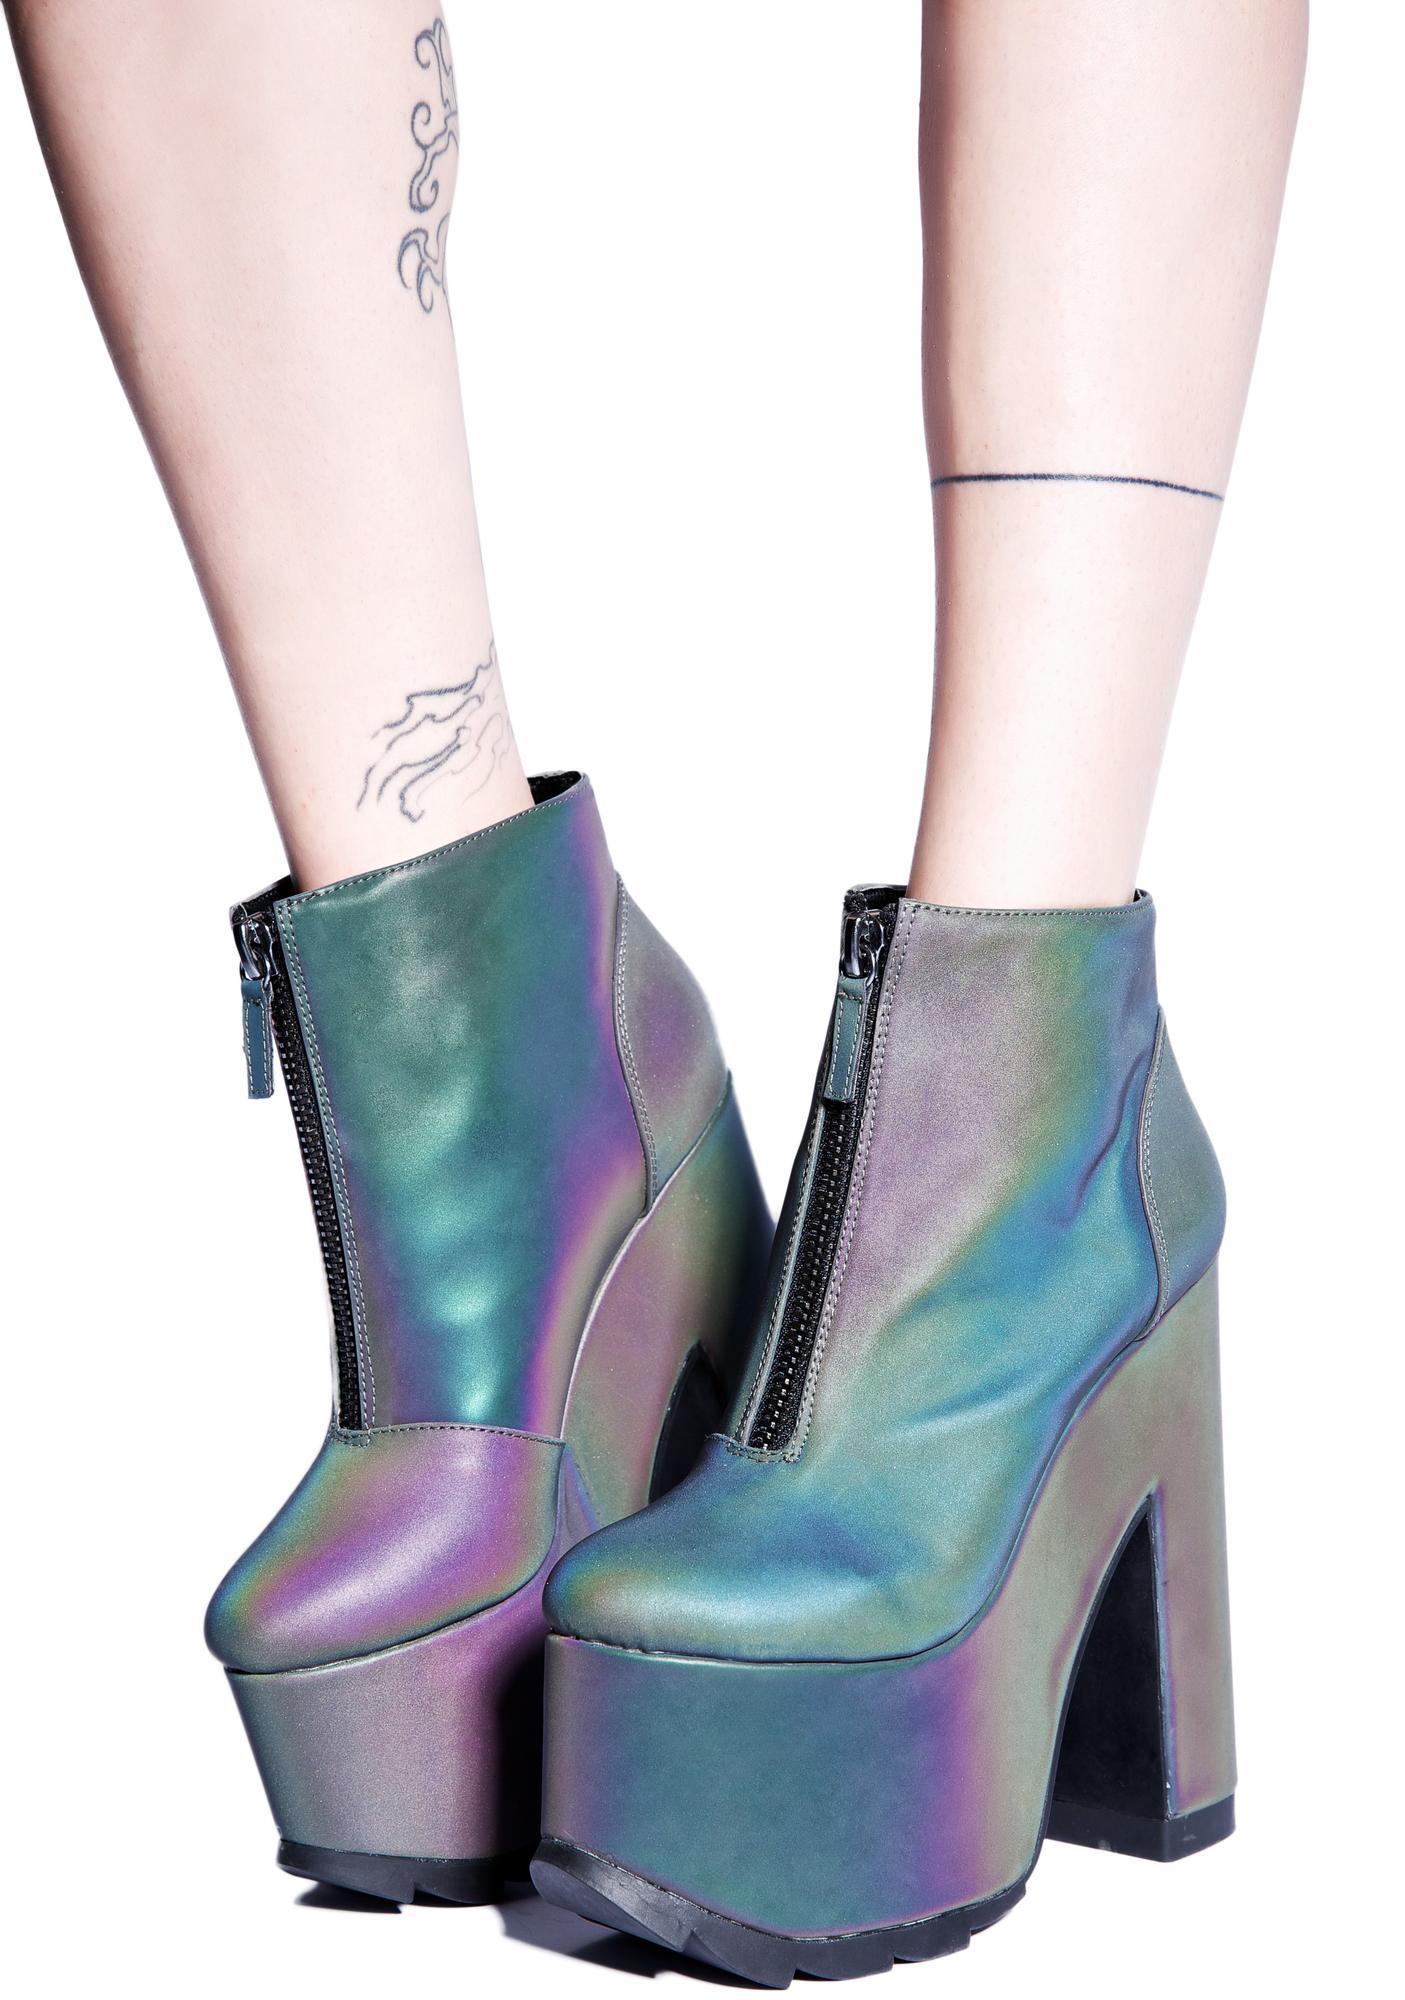 YRU Nightmare Shoe in Reflective 6, Reflective